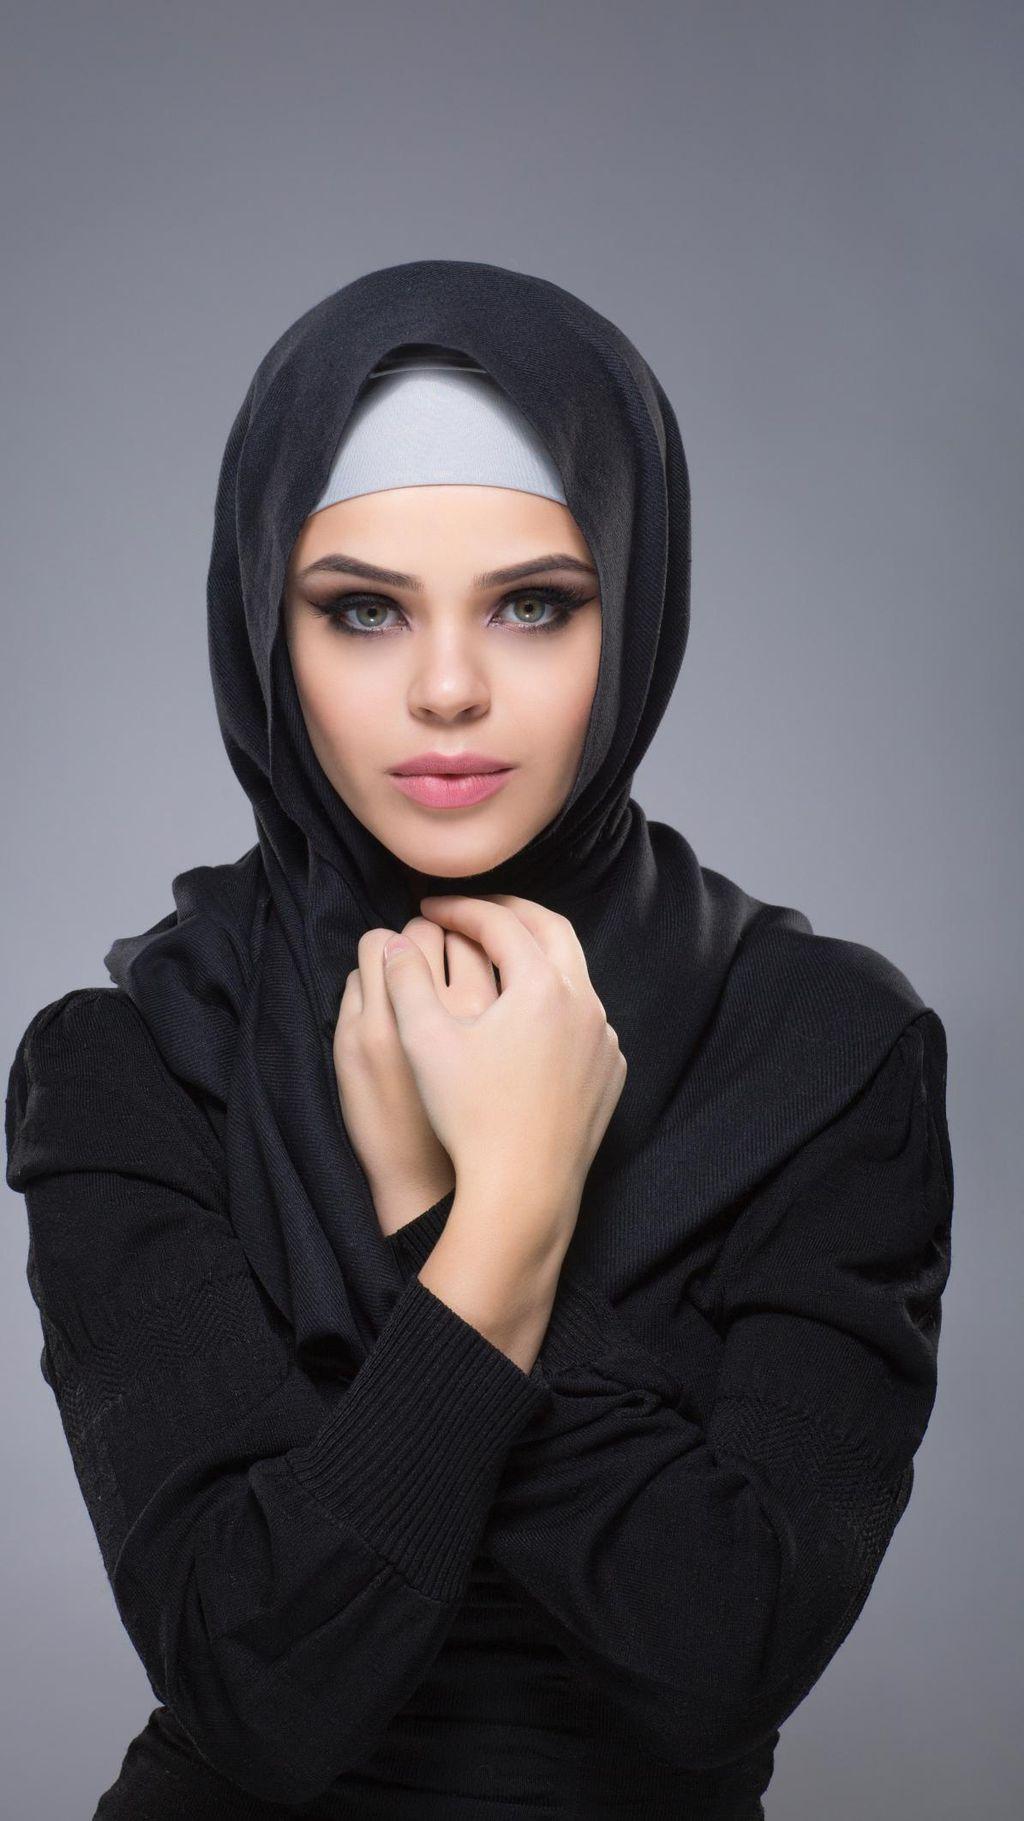 Heboh Iklan Billboard Bergambar 2 Wanita Berhijab di Australia